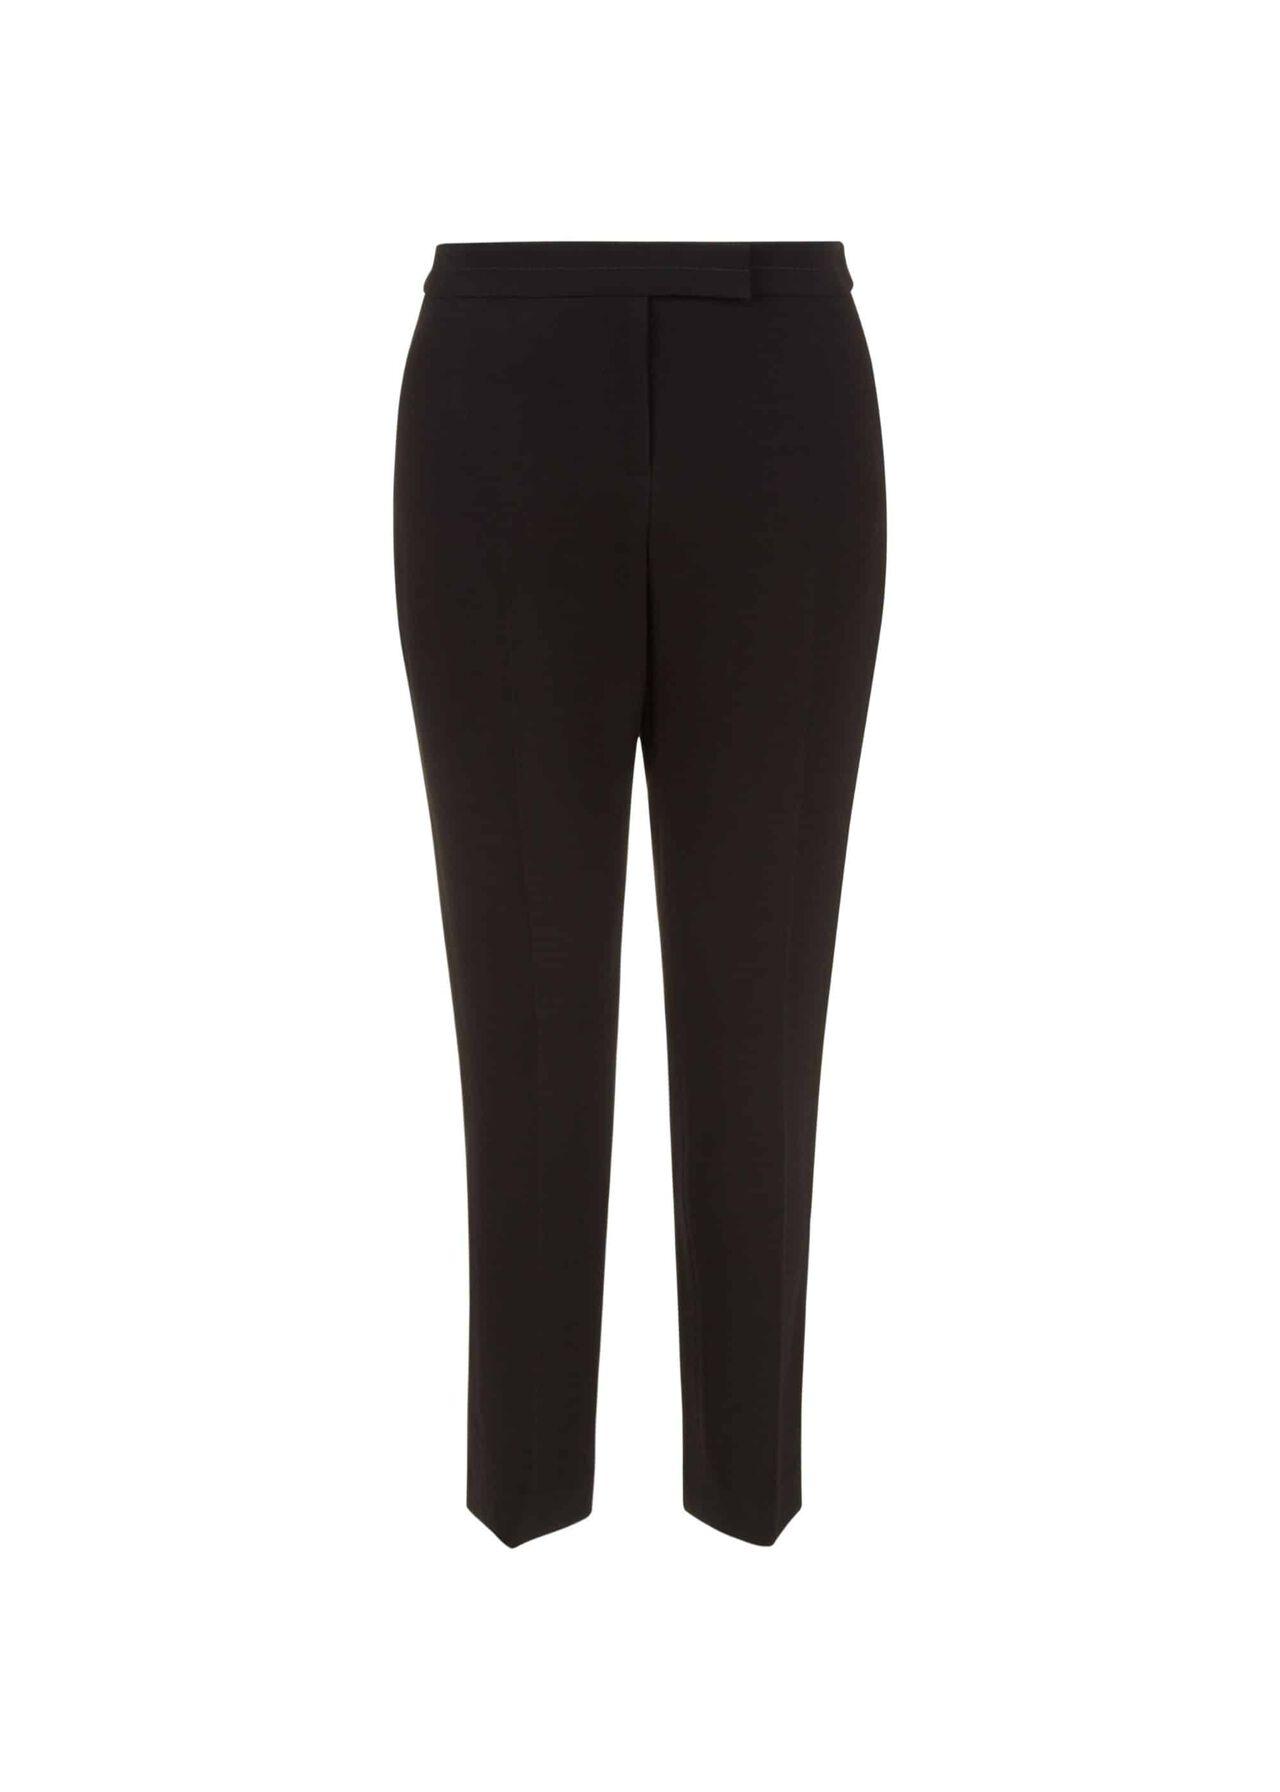 Petite Anne trousers Black